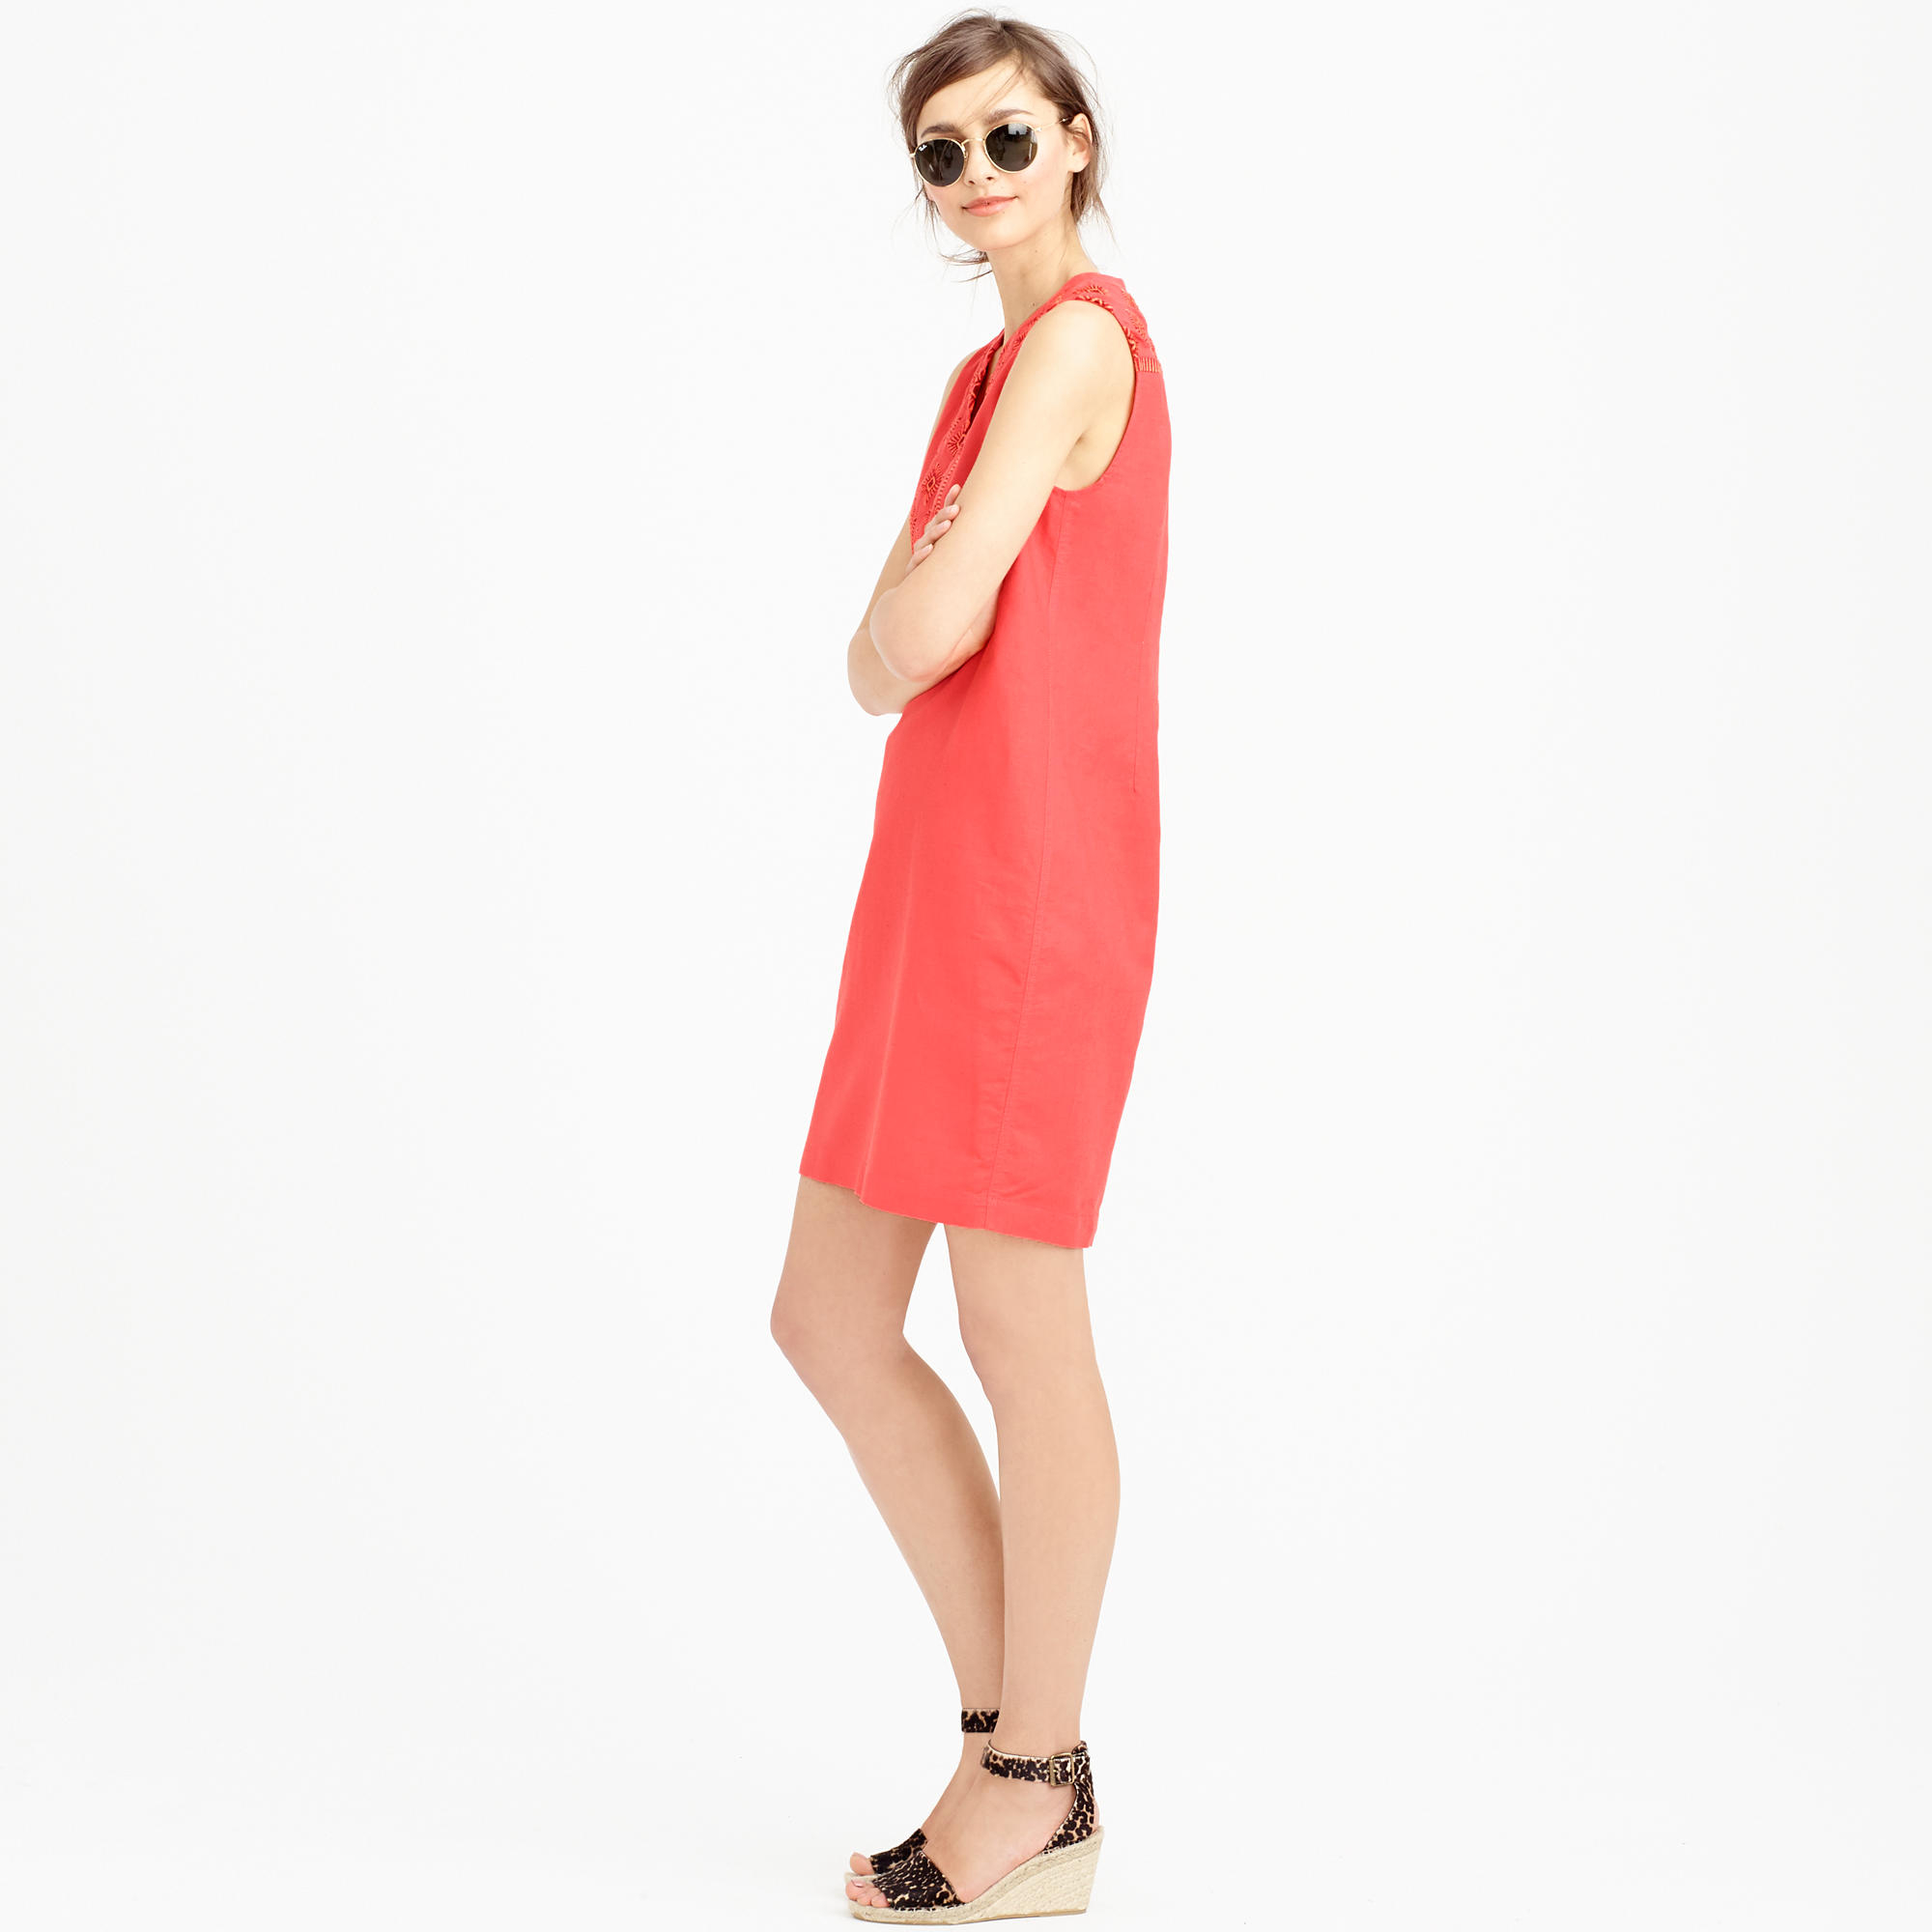 J Crew Petite Sleeveless Embroidered Sunburst Dress In Red